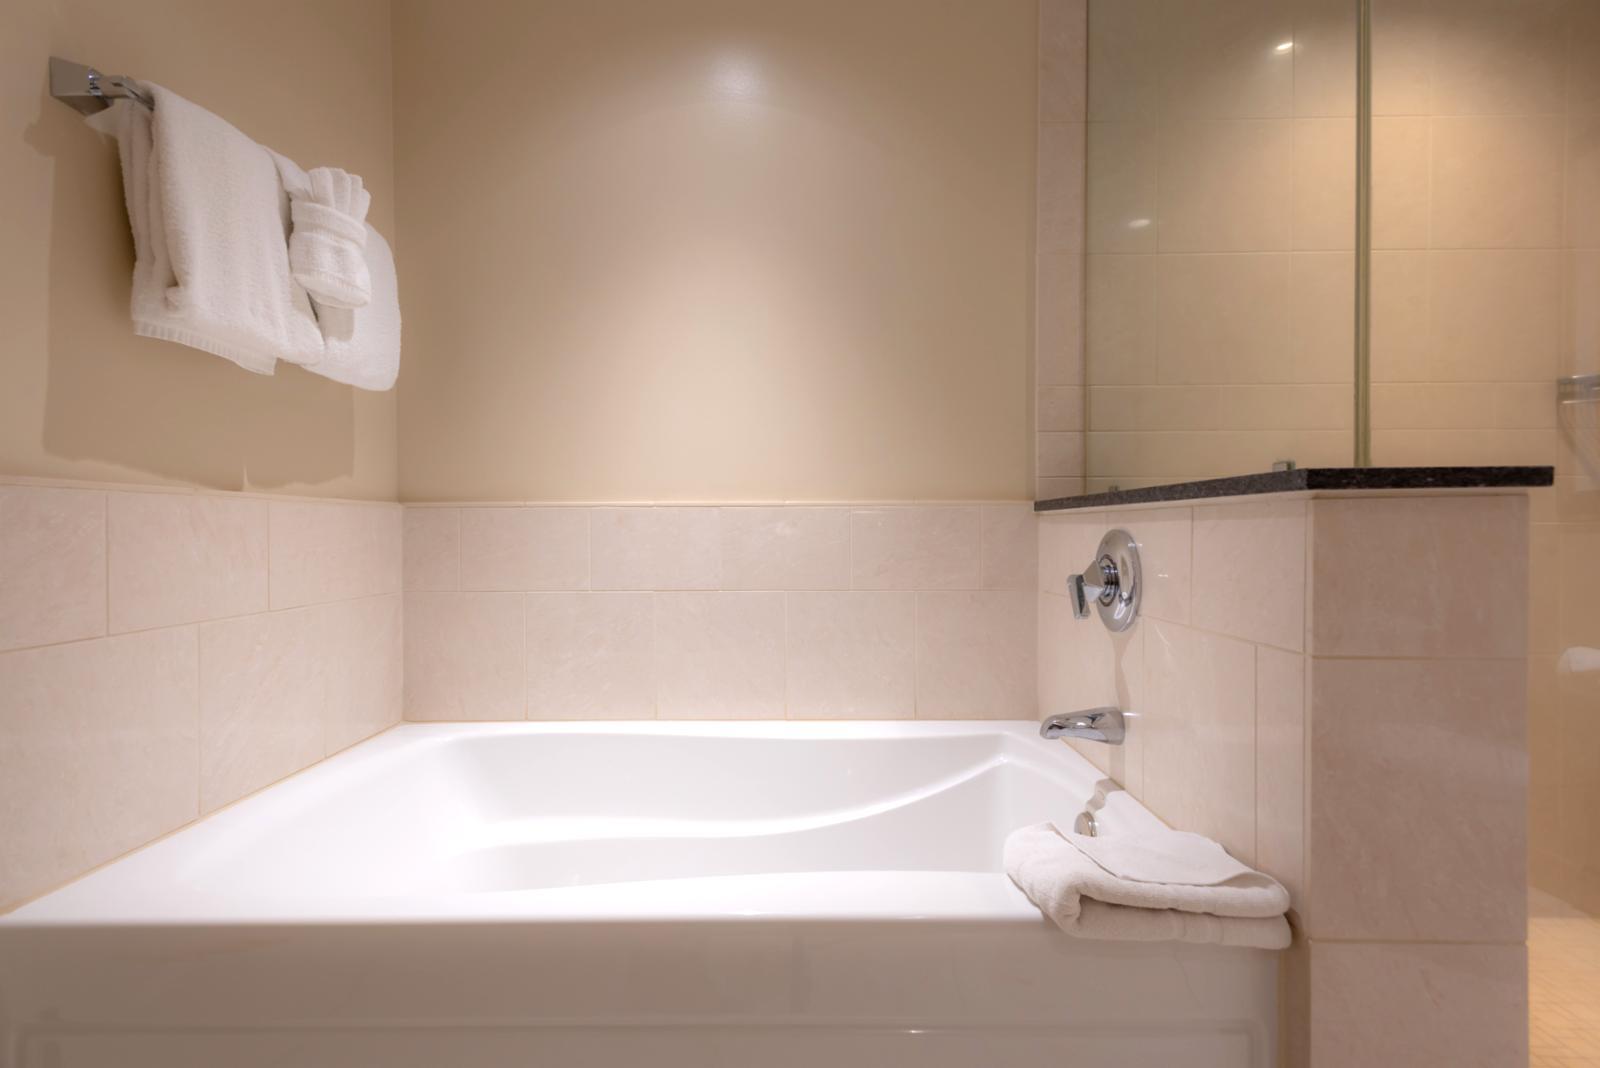 Comfortable soaking tub